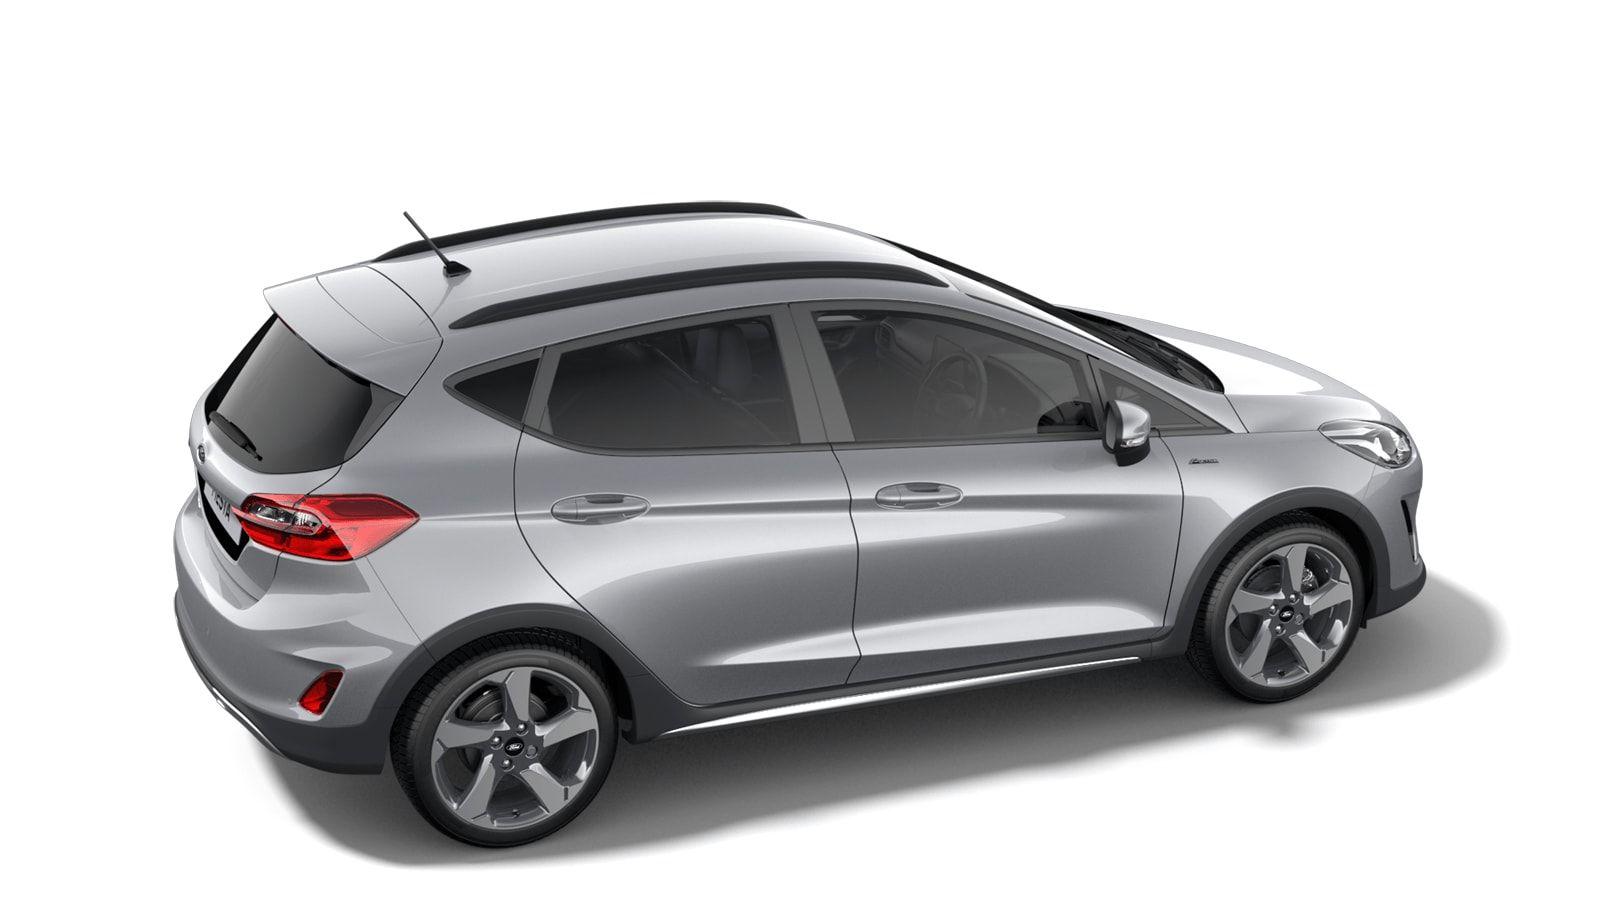 "Nieuw Ford All-new ford fiesta Active 1.0i EcoBoost mHEV 125ps / 92kW M6 - 5d JK6 - Metaalkleur ""Moondust Silver"" 4"